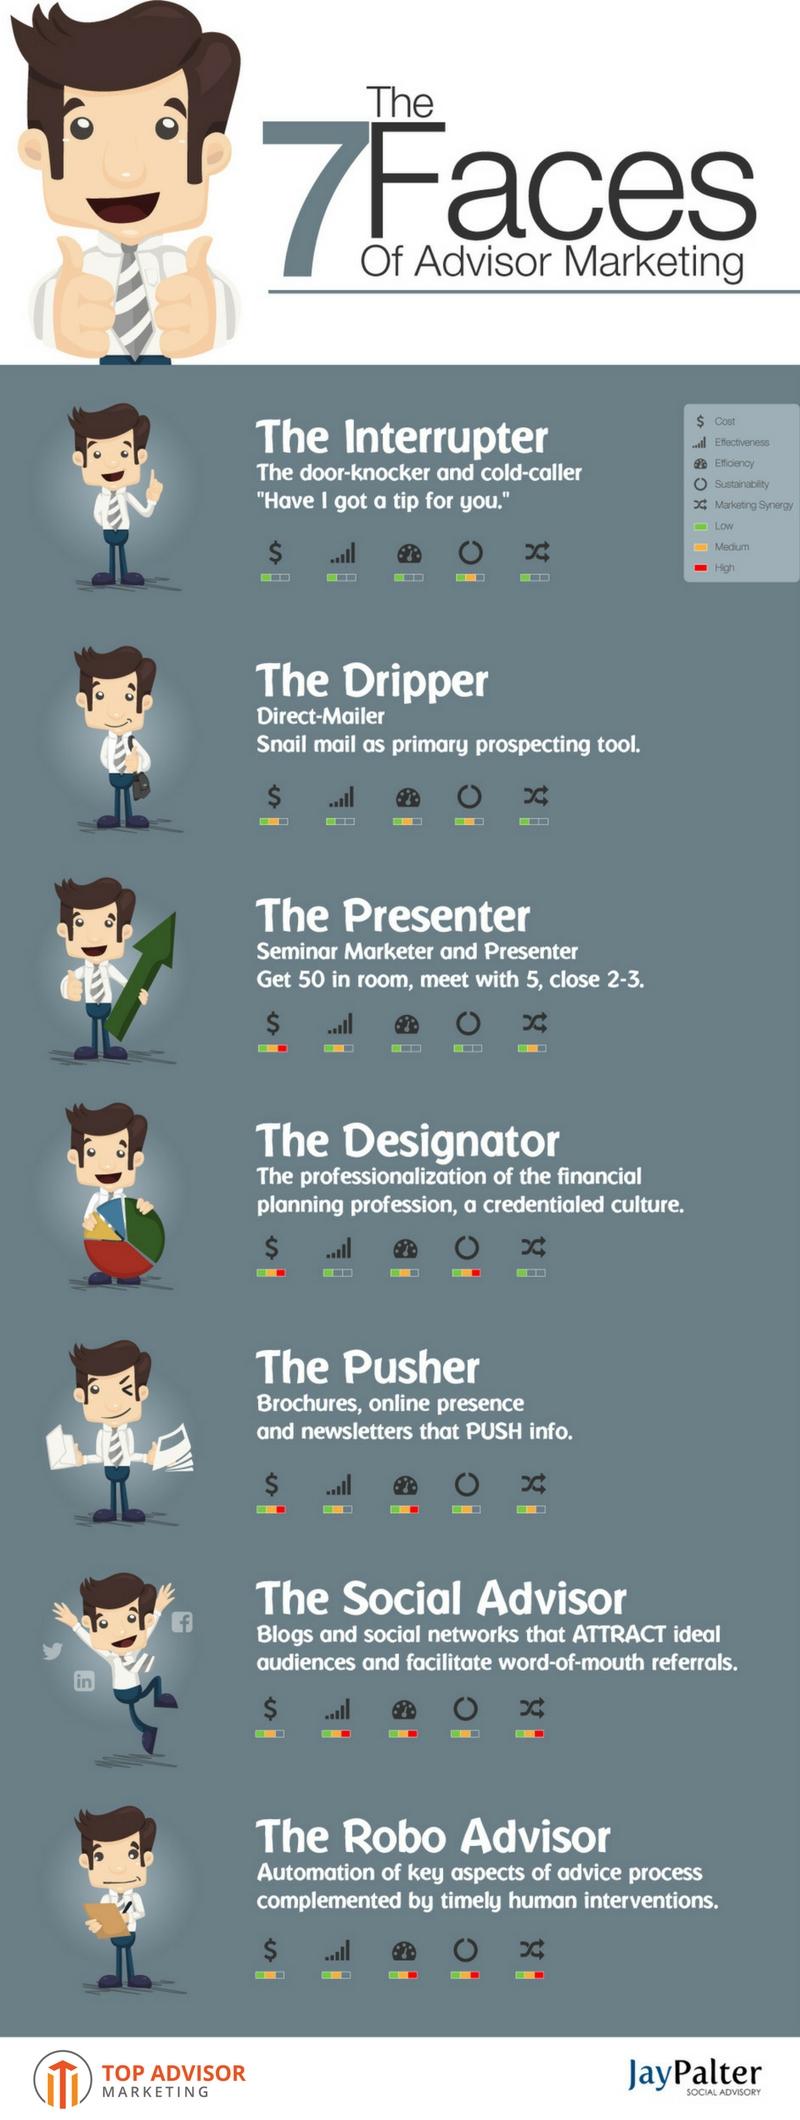 7 Faces of Advisor Marketing